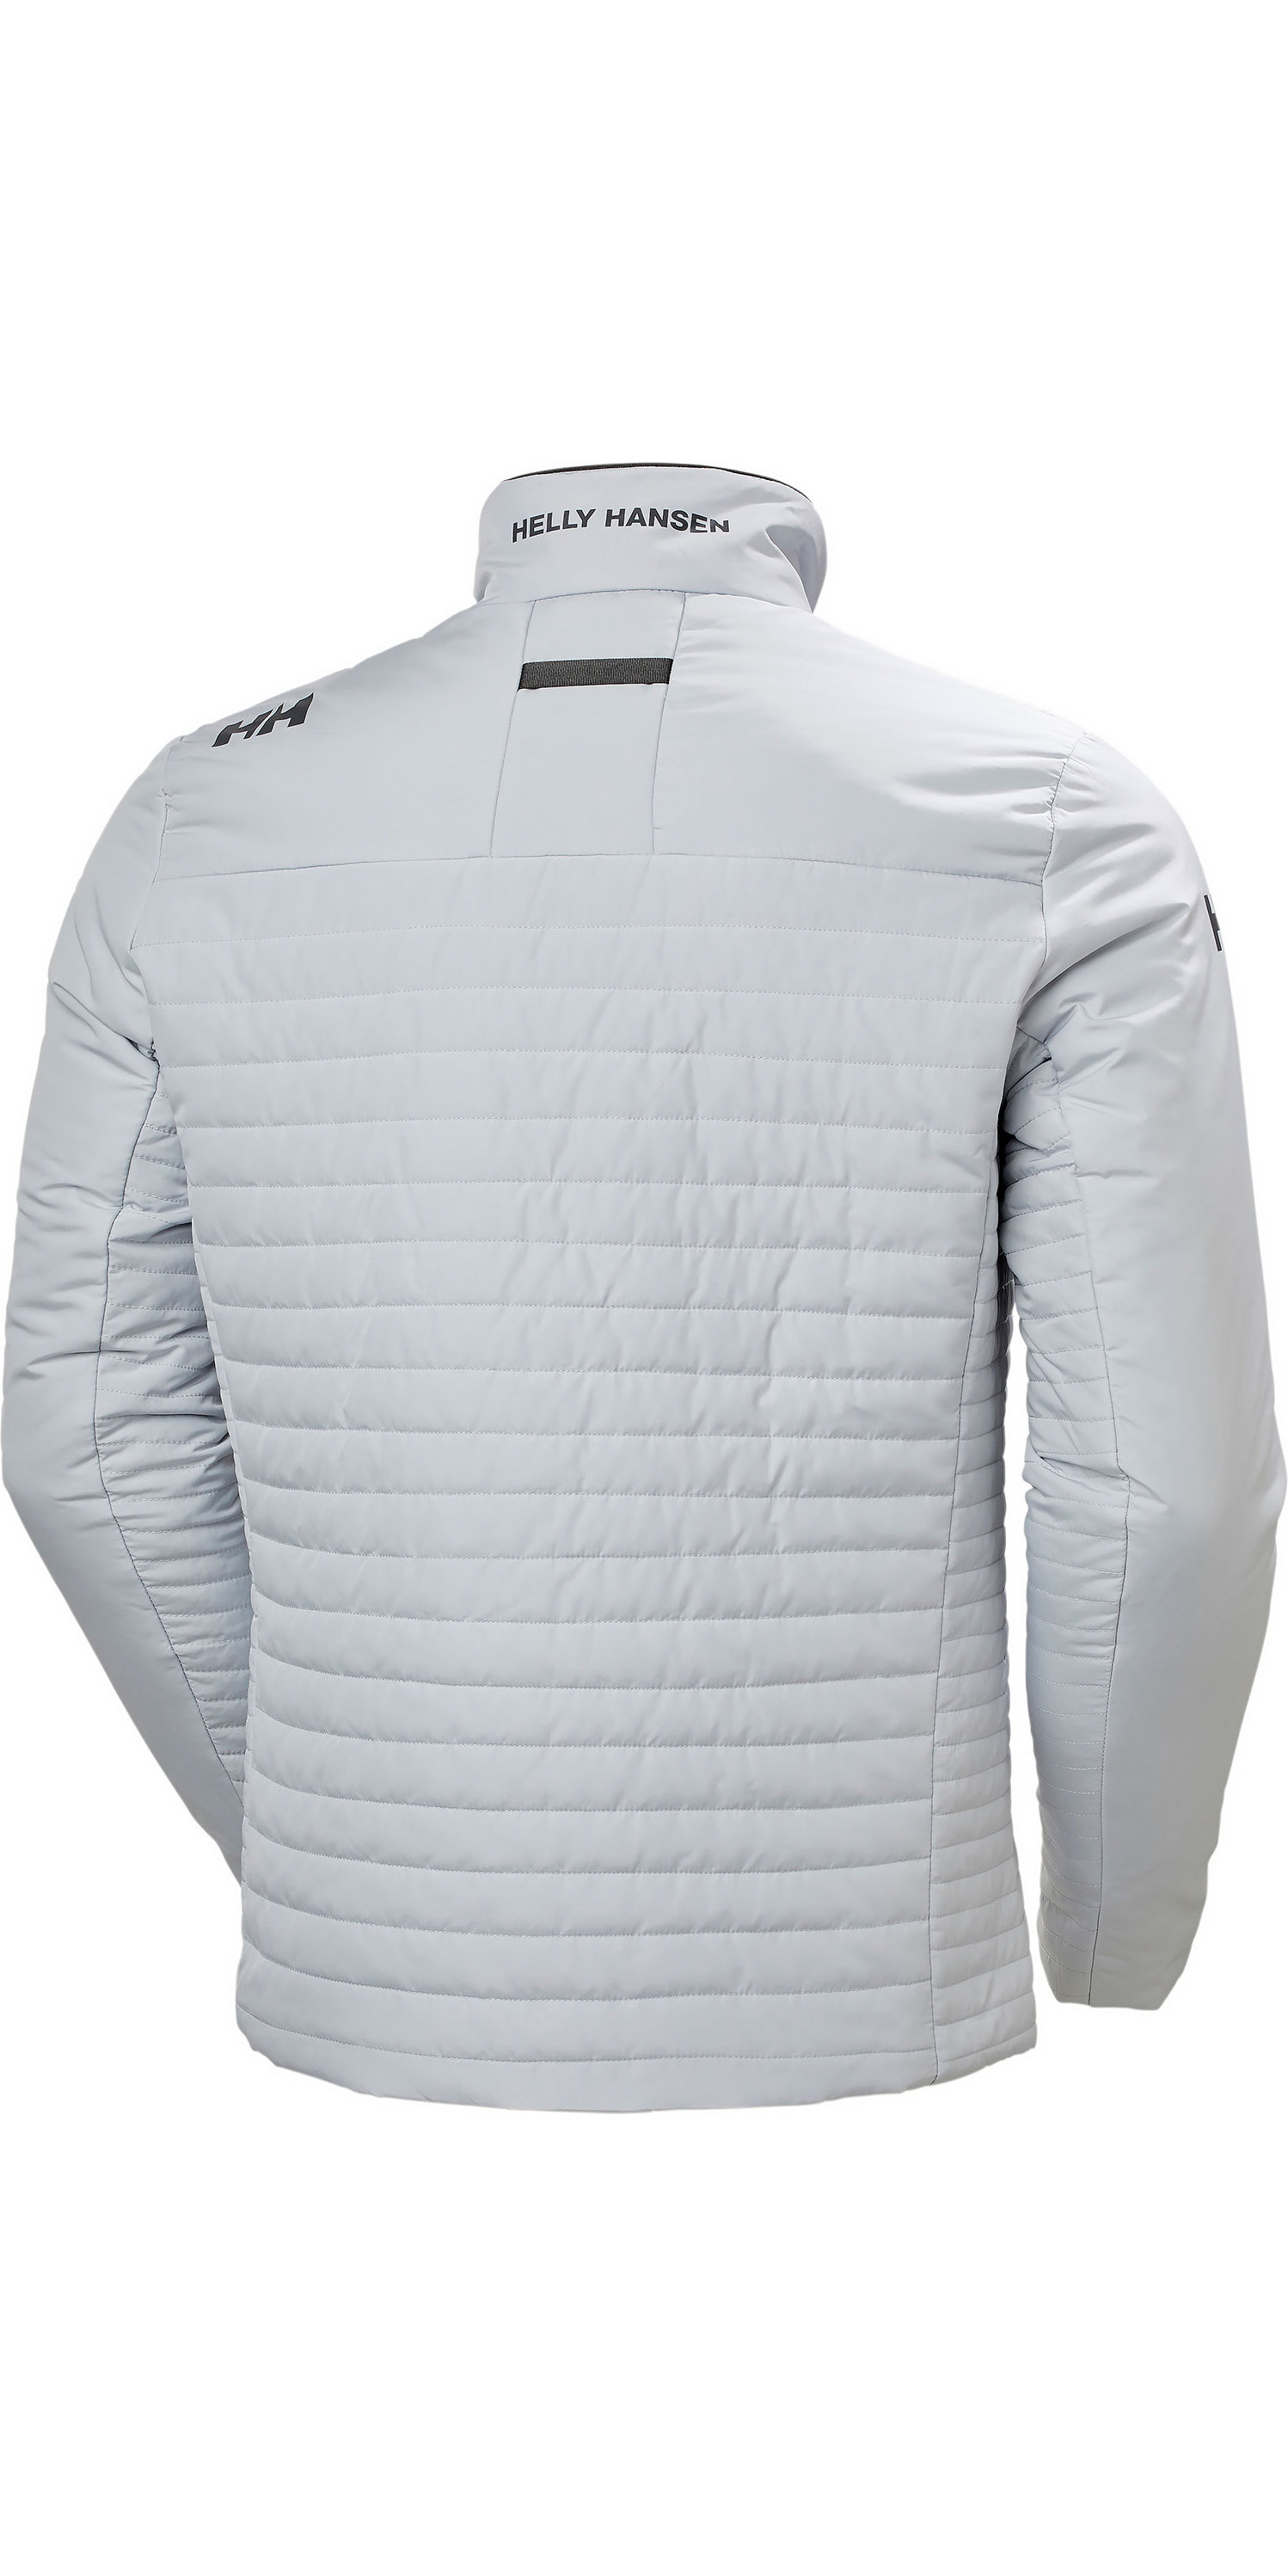 Helly Hansen Crew Insulator Jacket miesten kevytvanutakki